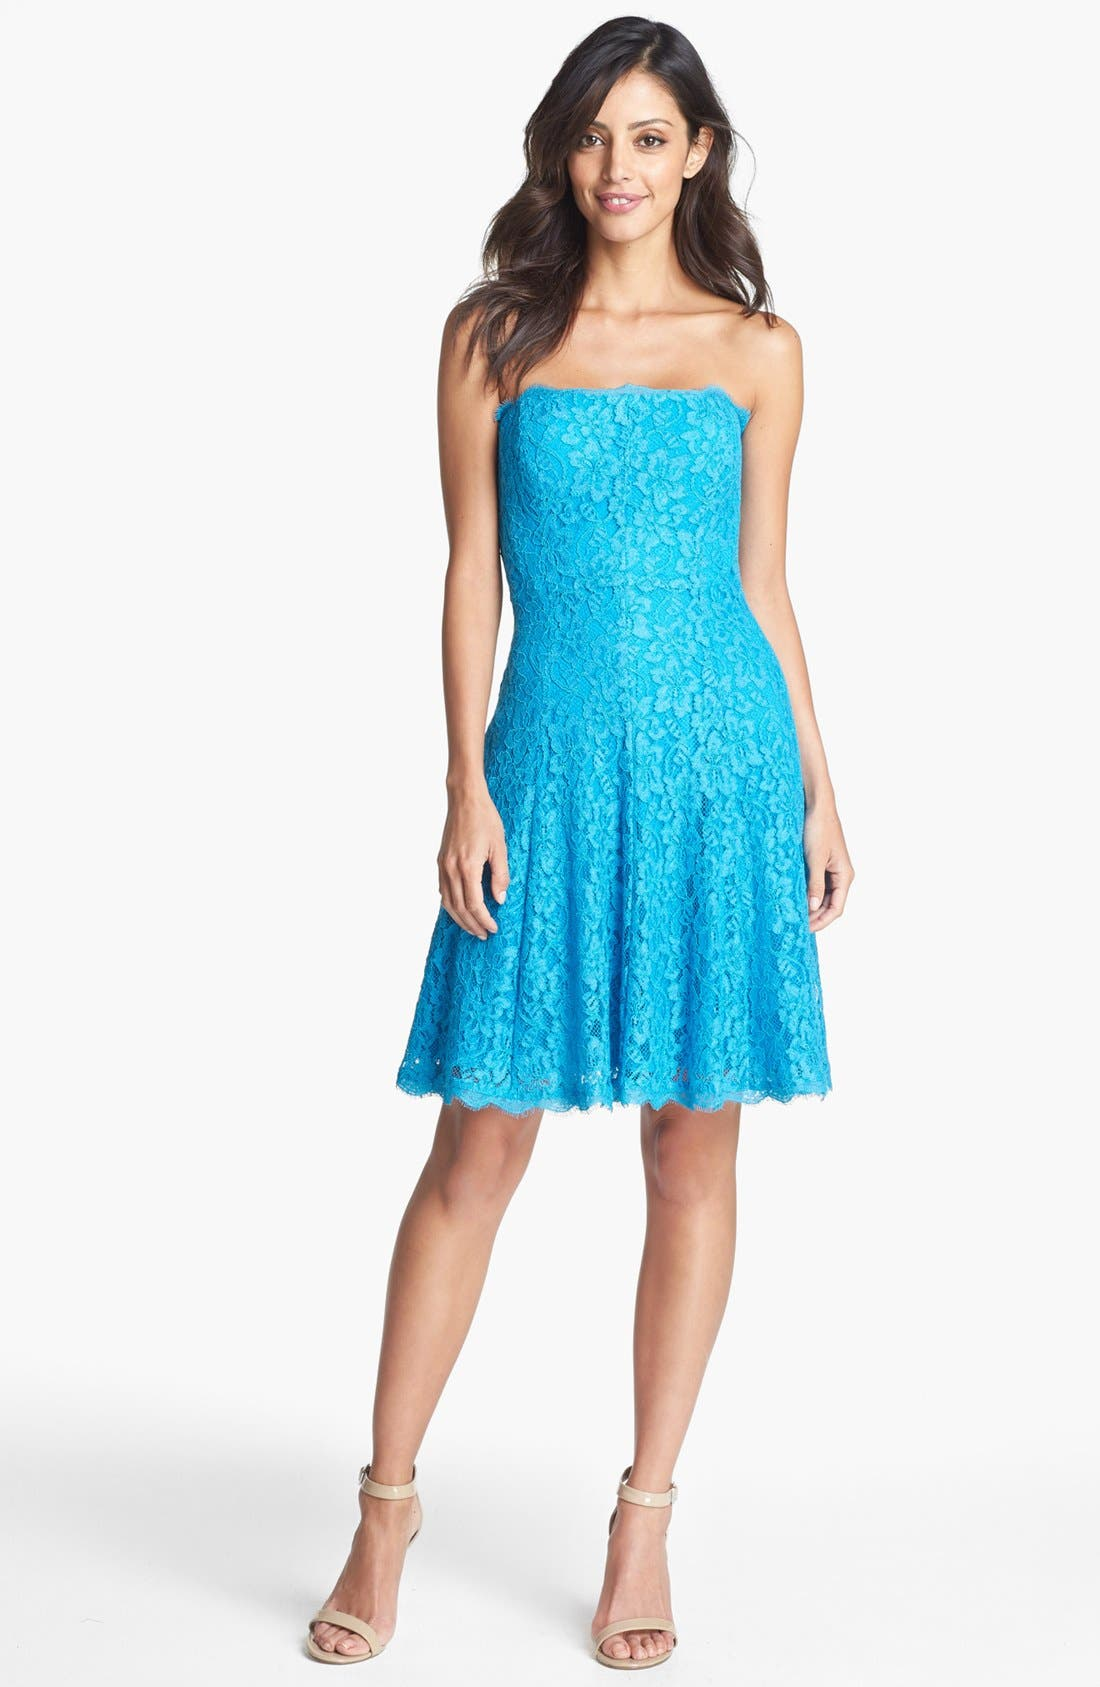 Main Image - Adrianna Papell Strapless Lace Dress (Regular & Petite)